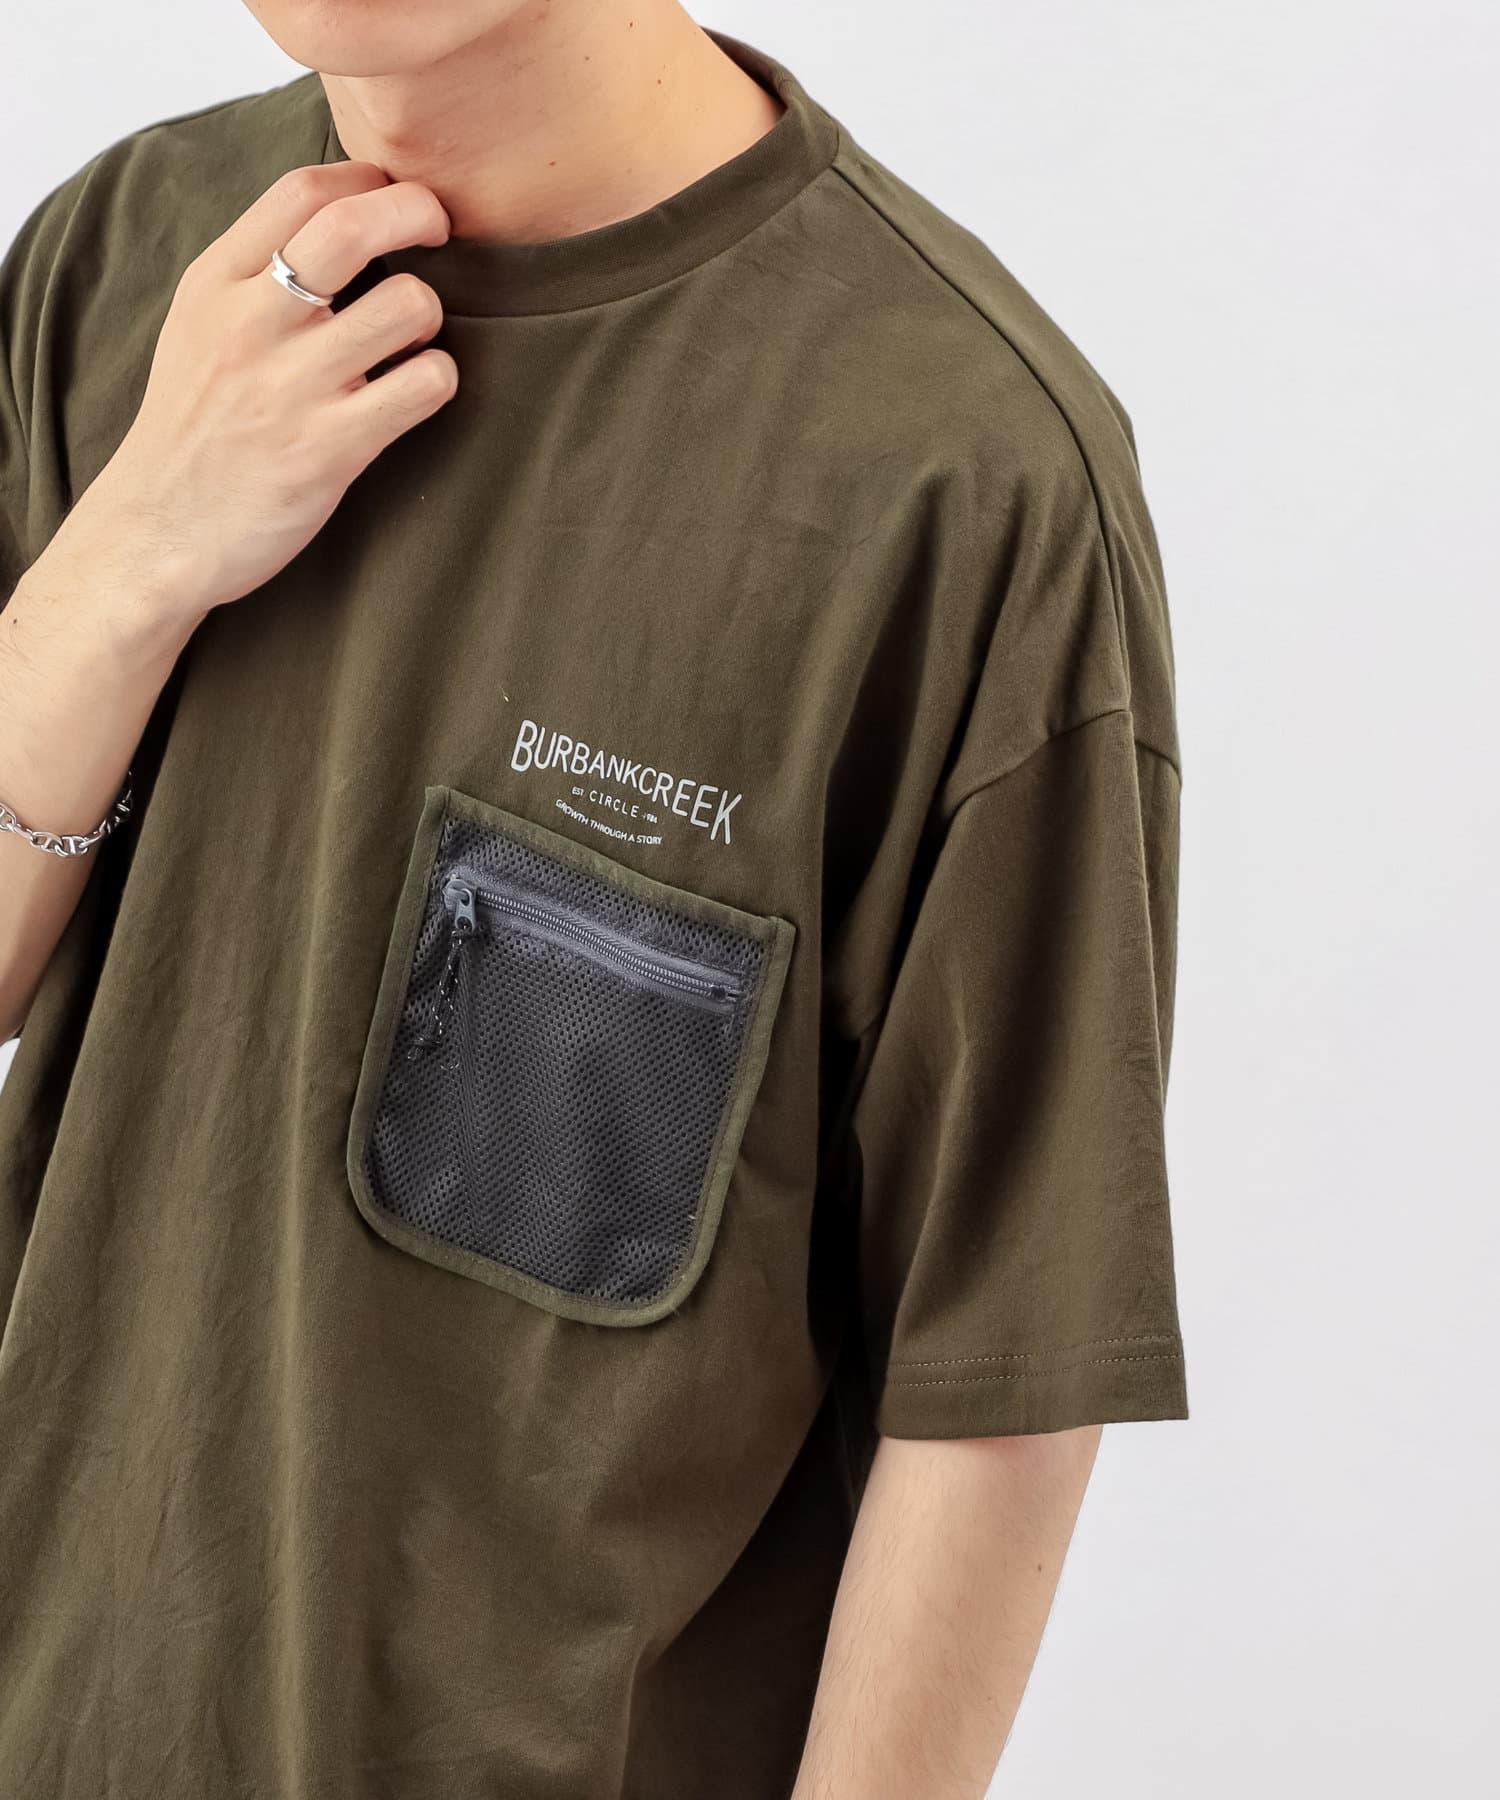 Discoat(ディスコート) メンズ 【BURBANKCREEK】ポケットメッシュTシャツ カーキ